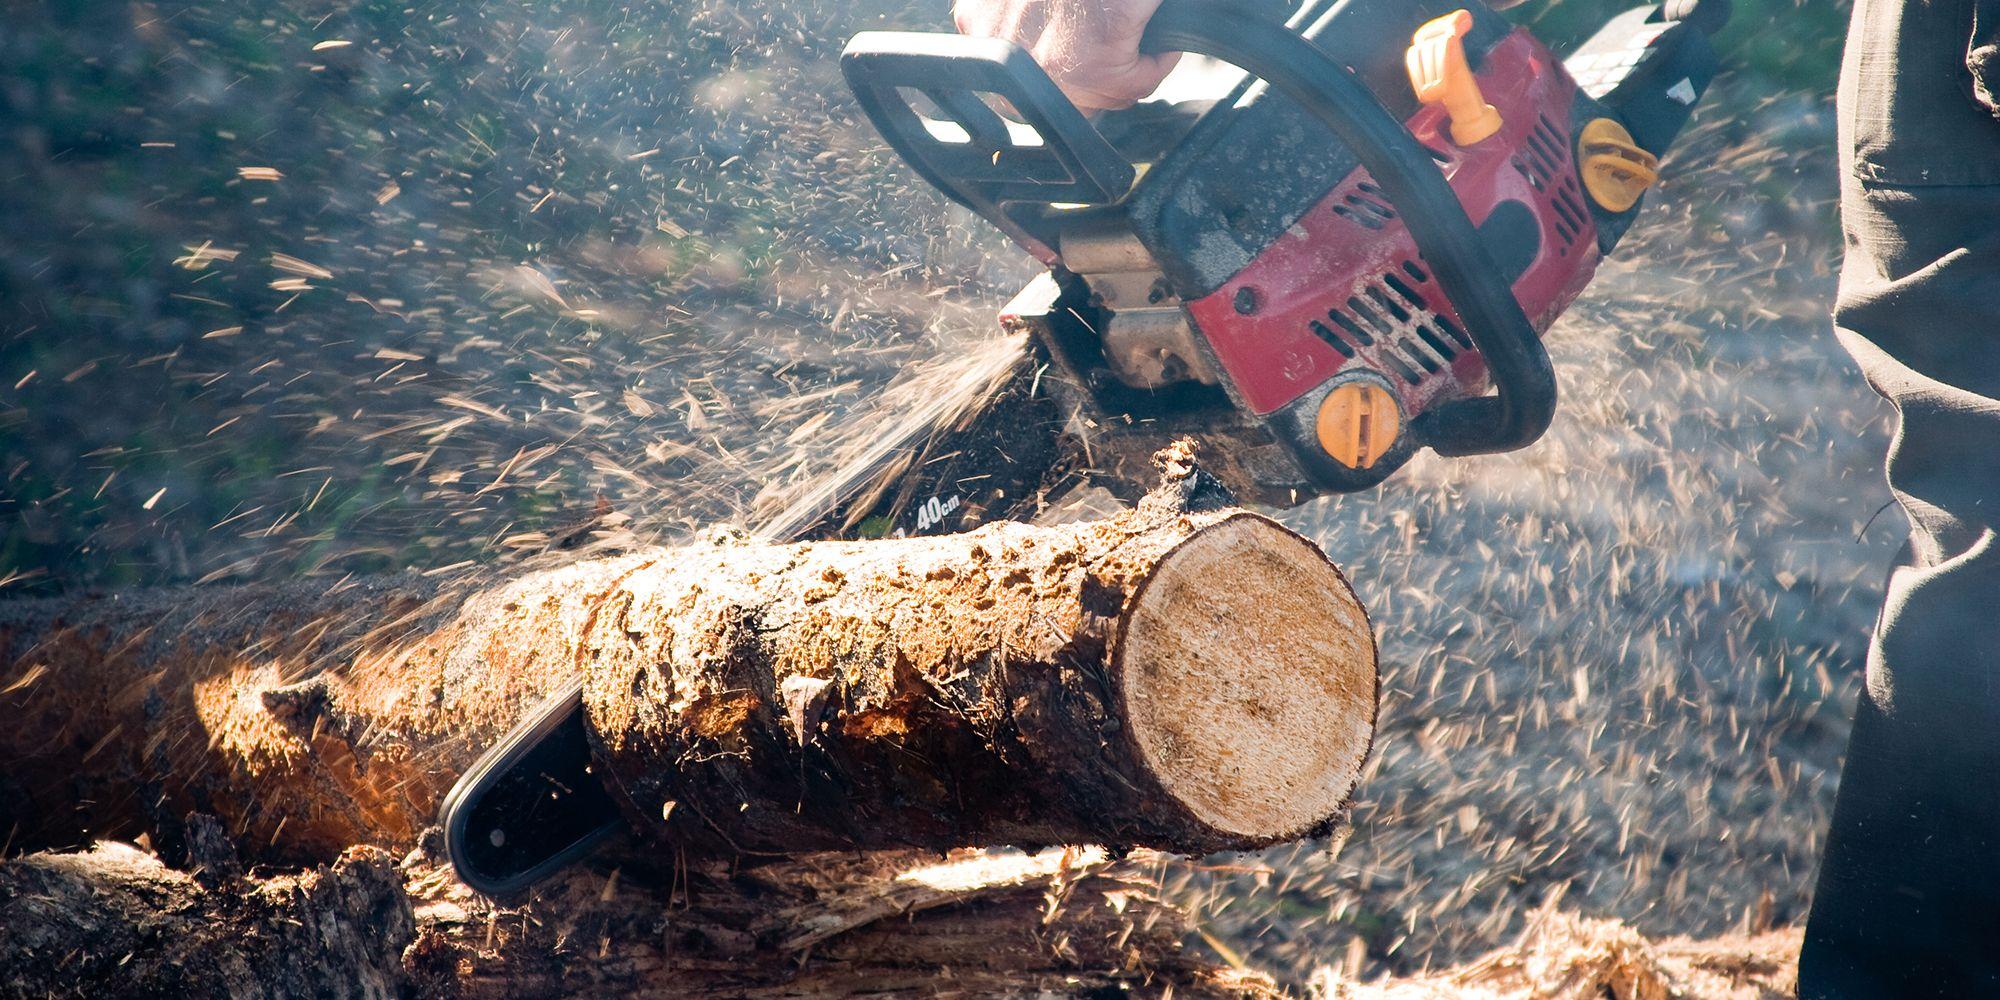 Splitting how to split. Firewood clipart single wood log